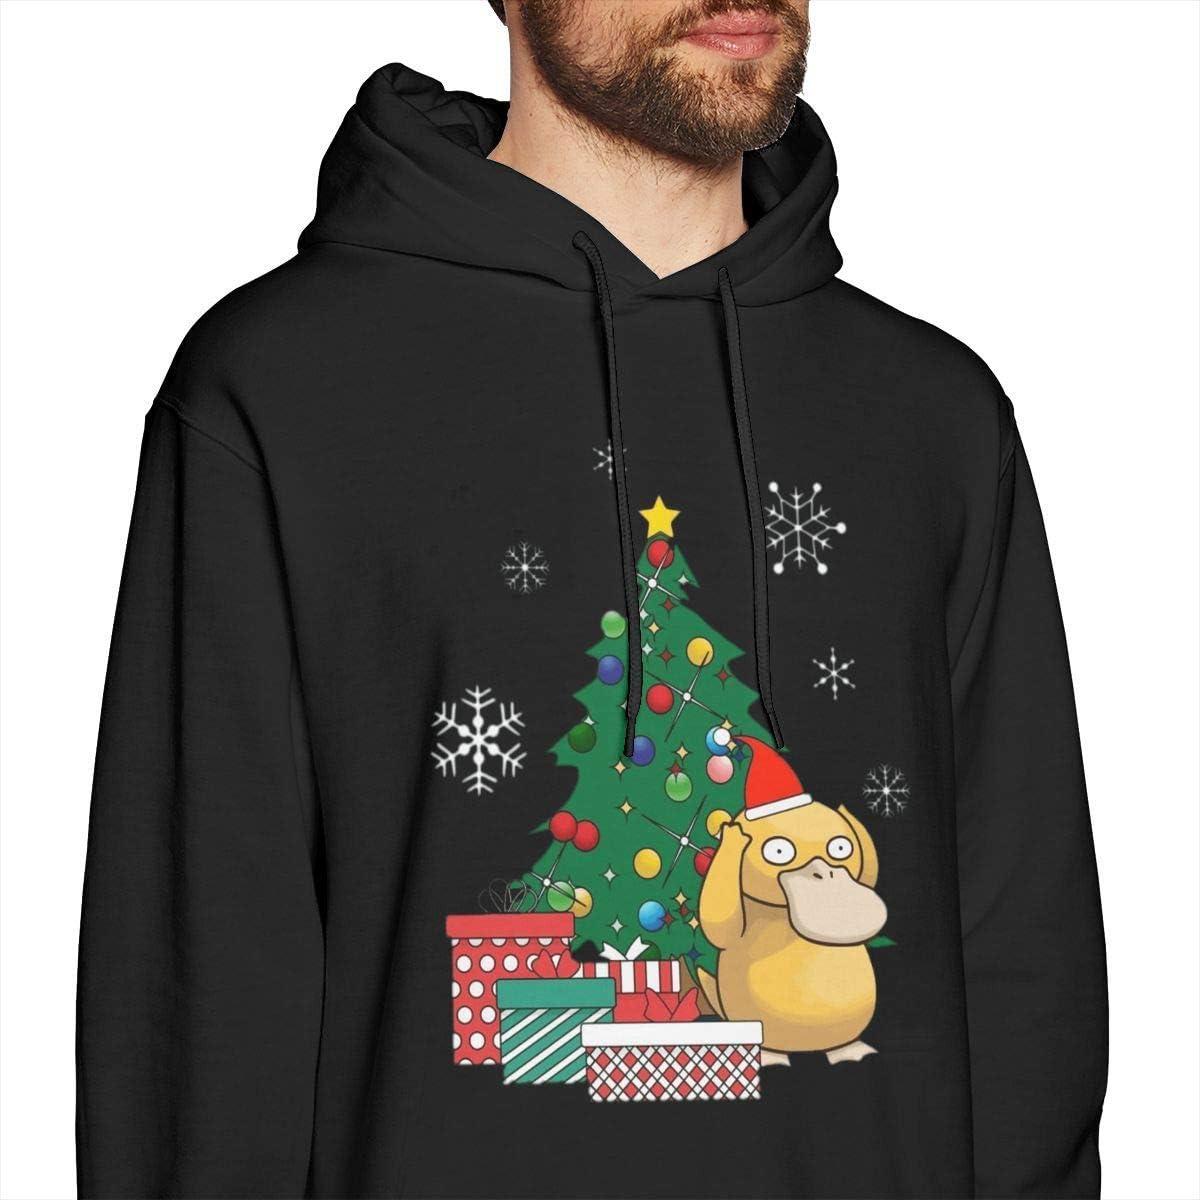 shotngwu Snorlax Around The Christmas Tree Mens Pullover Hoodies Crewneck Long Sleeve Sweatshirt Black Xx-large style2